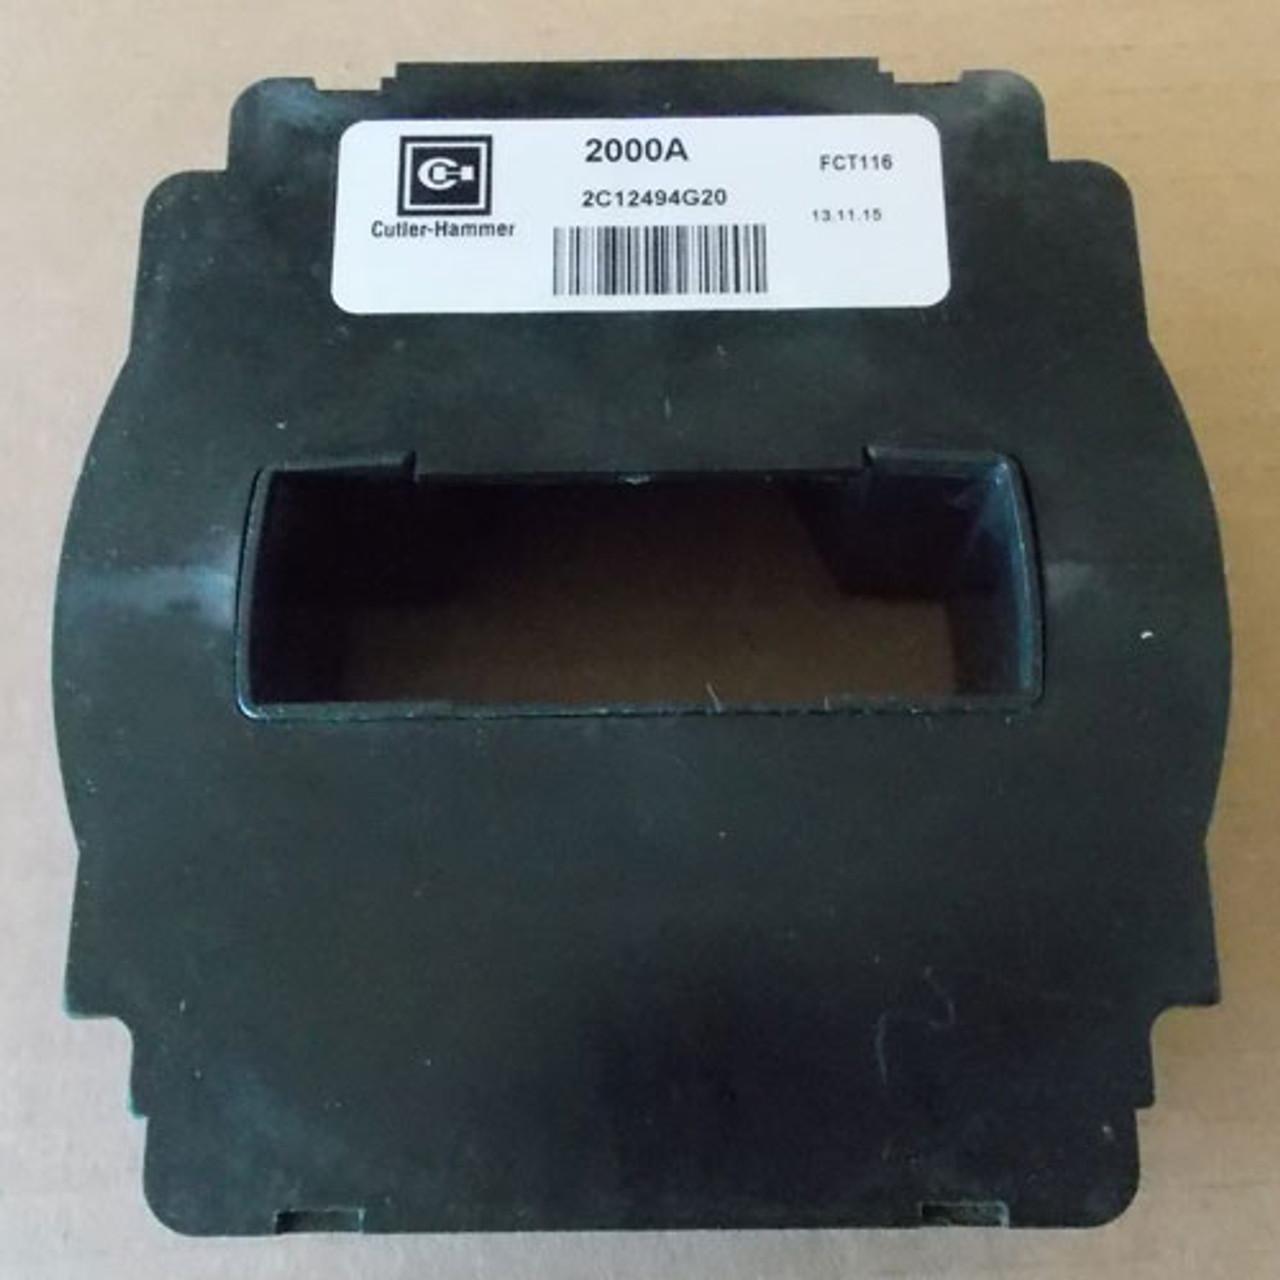 Cutler Hammer 2C12494G20 FCT116 Current Sensor 2000 Amp - New